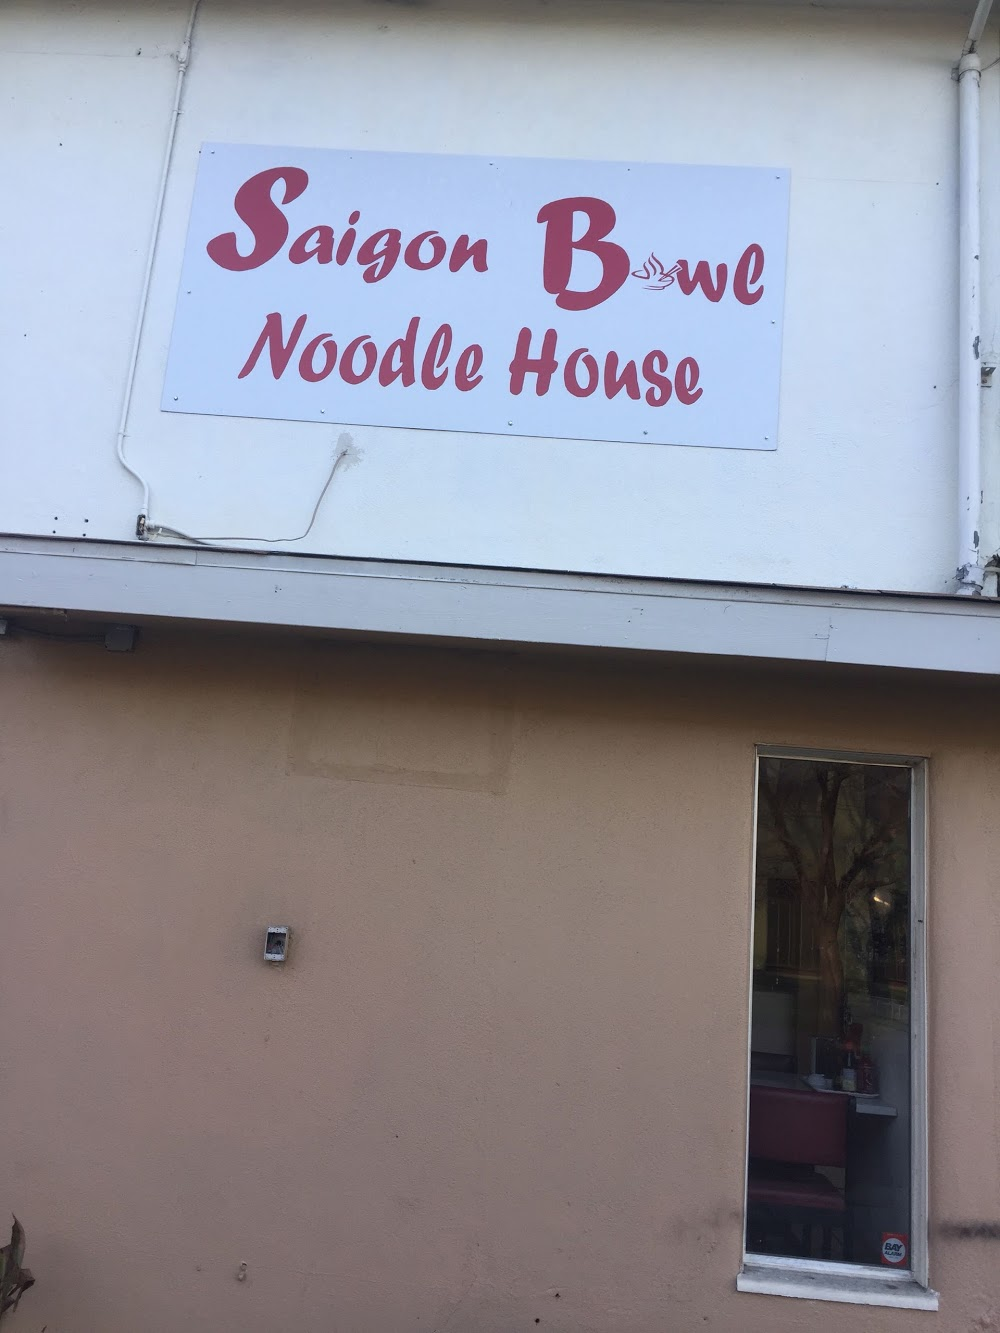 Saigon Bowl Noodle House